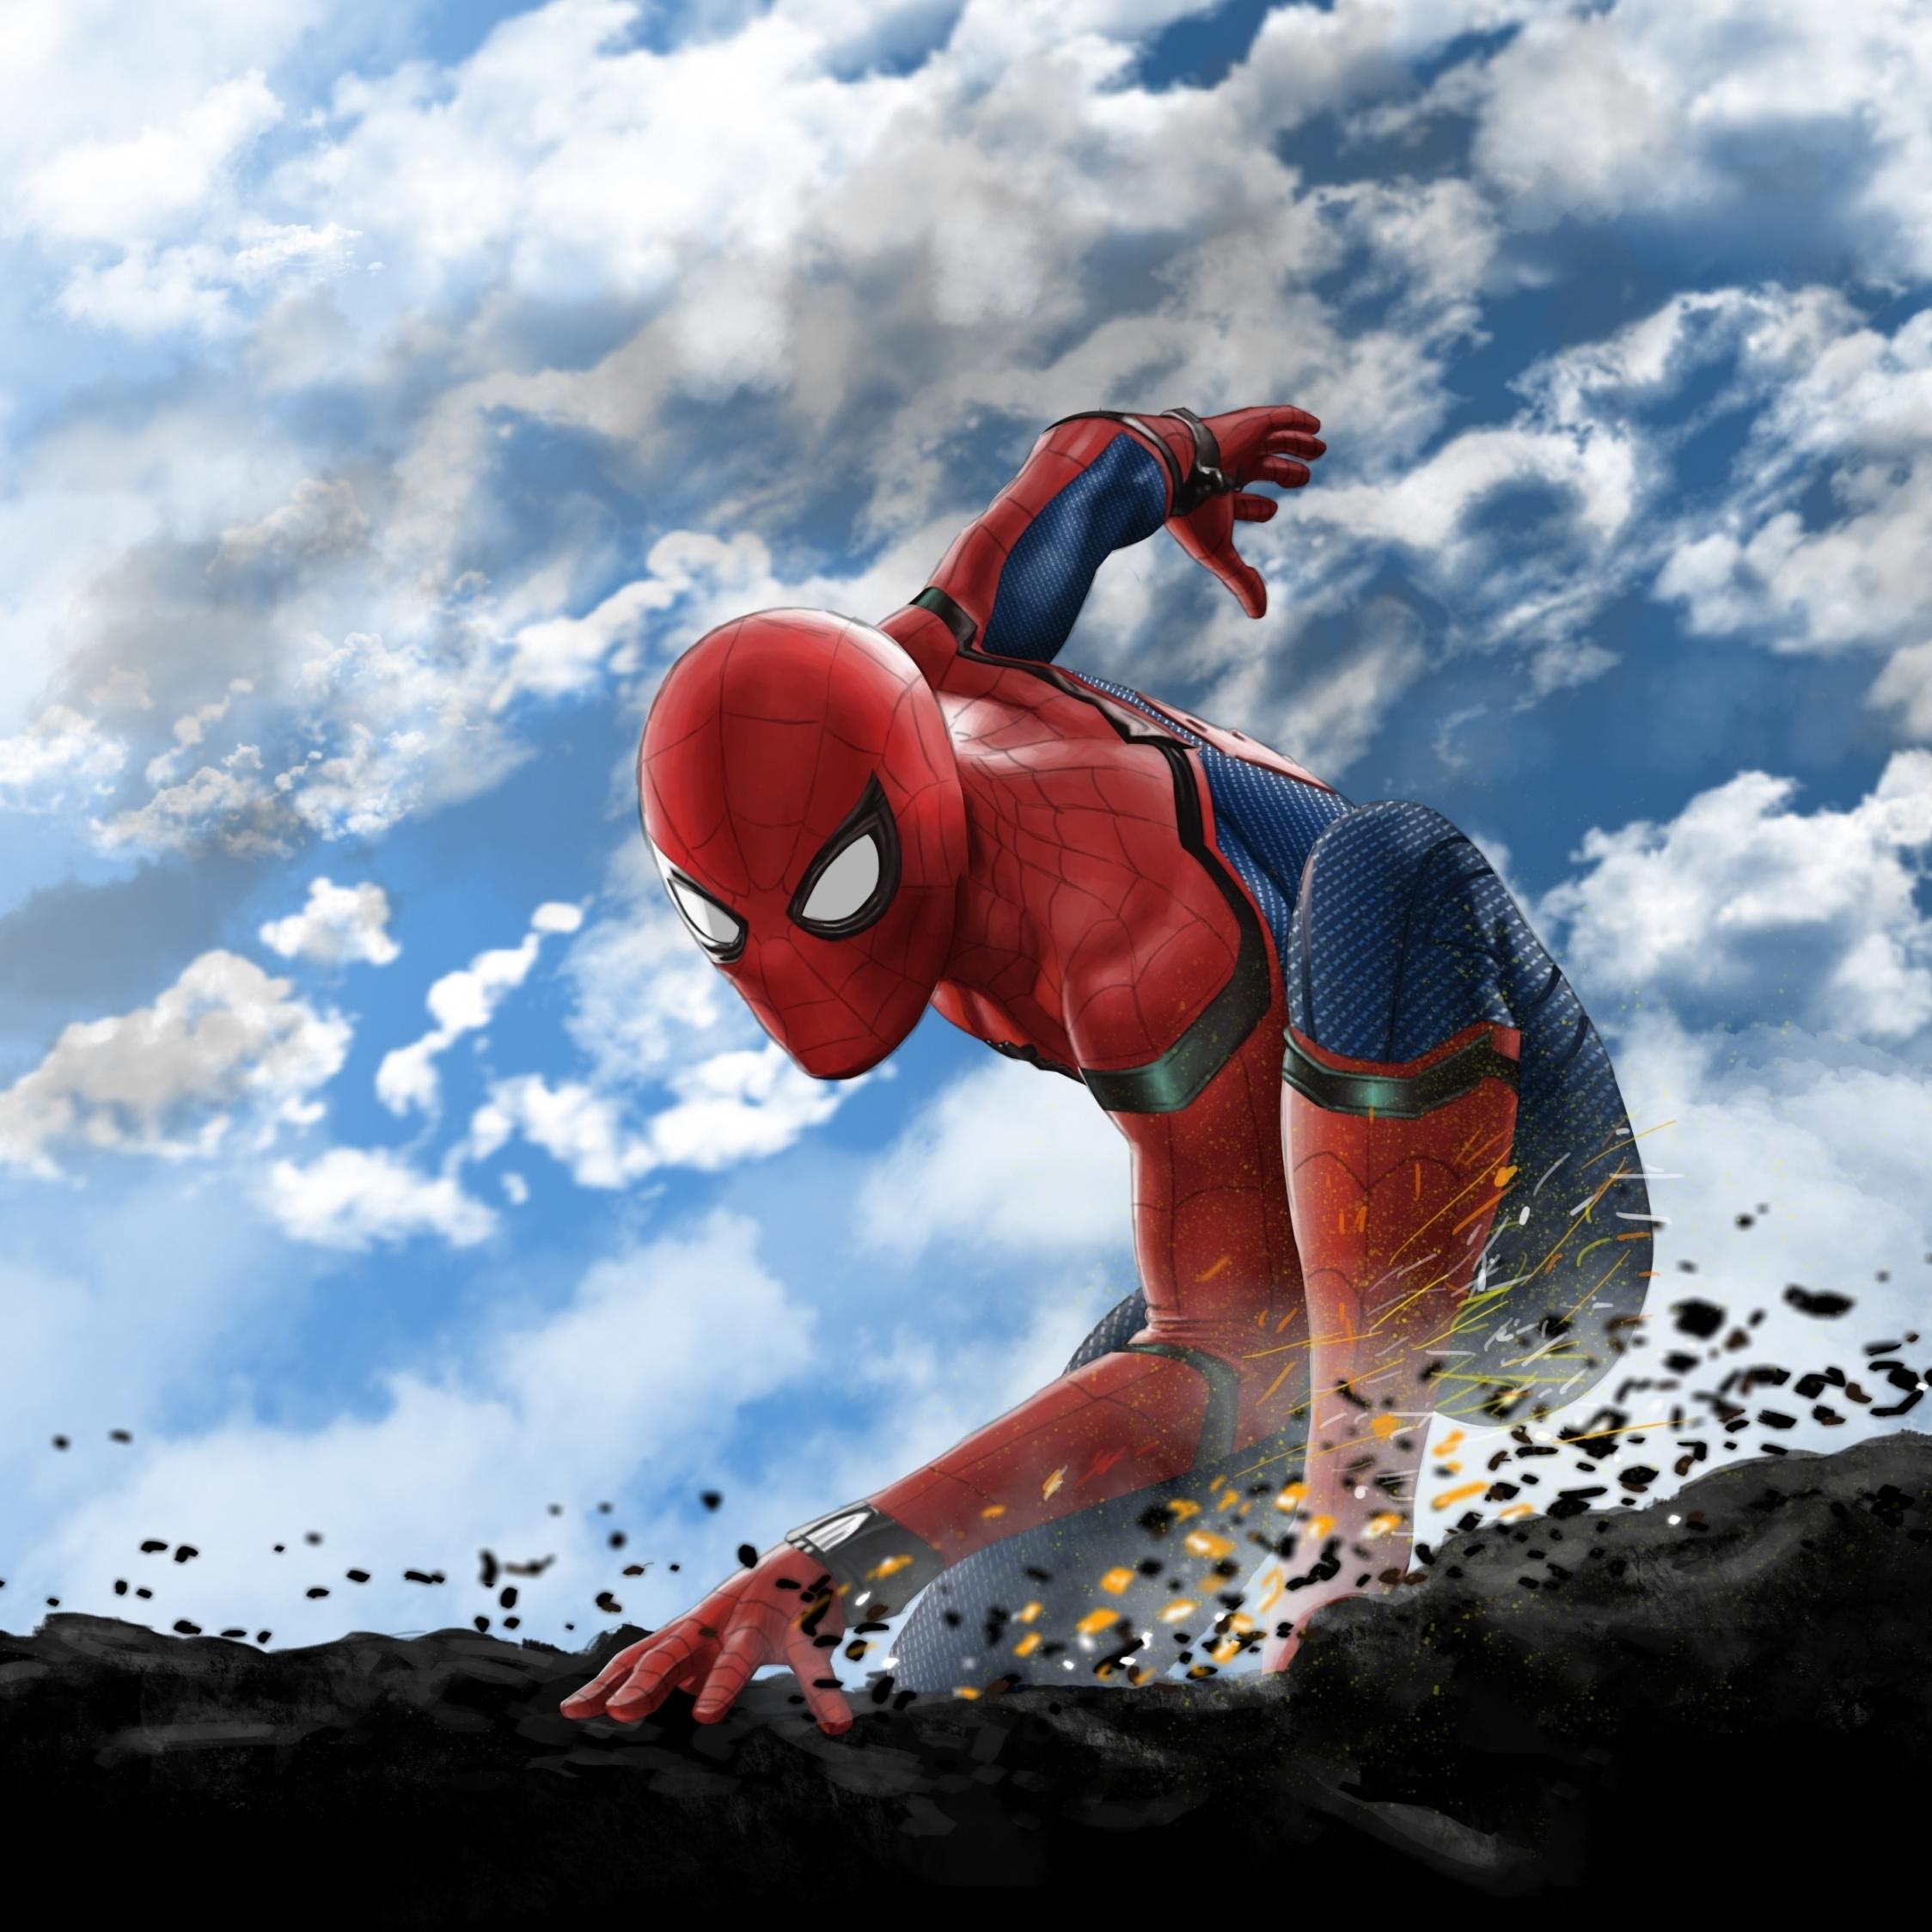 Download 2248x2248 Wallpaper Spider-man, Superhero, Art